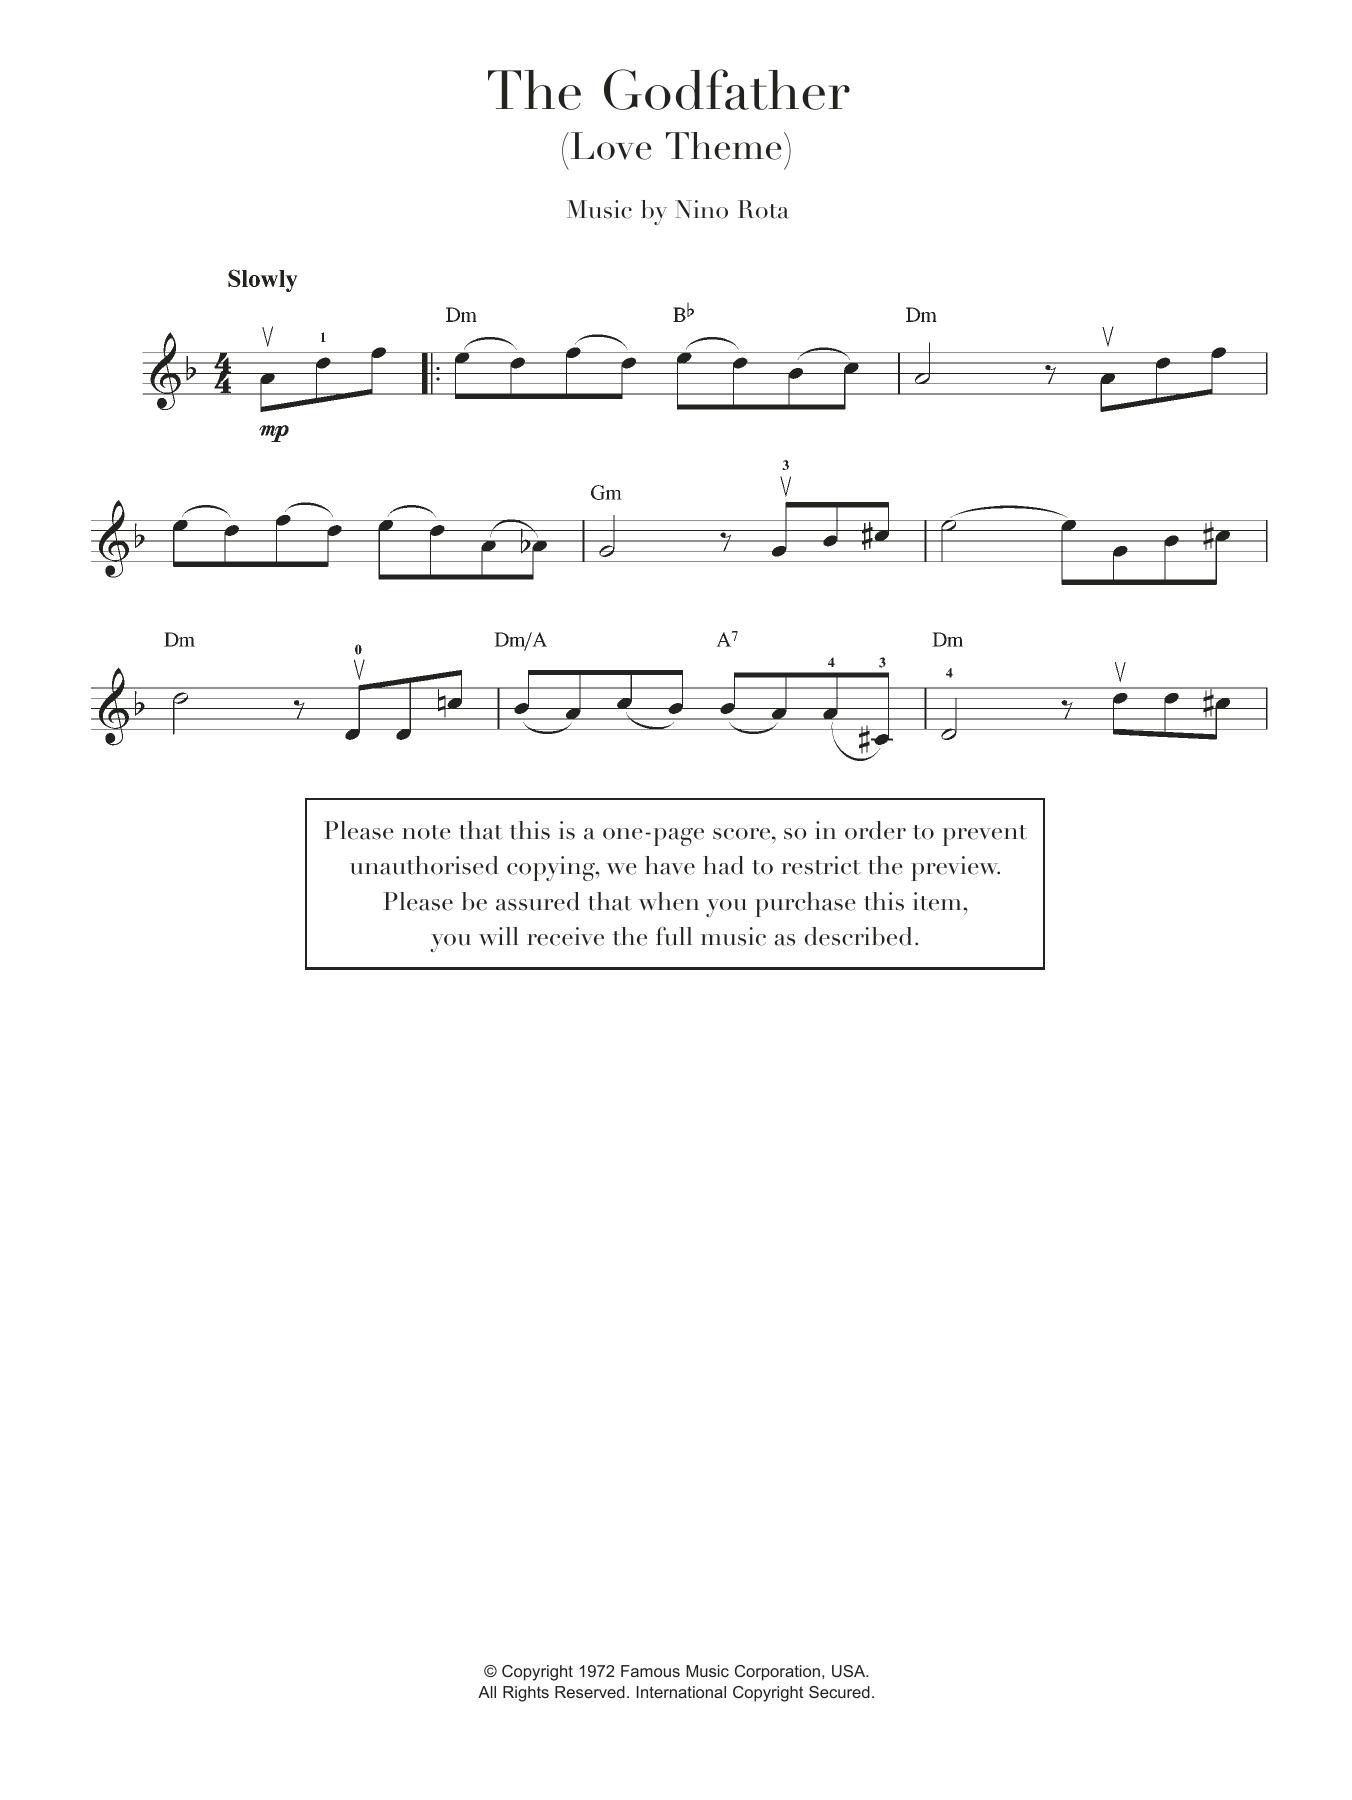 Nino Rota - Theme from The Godfather